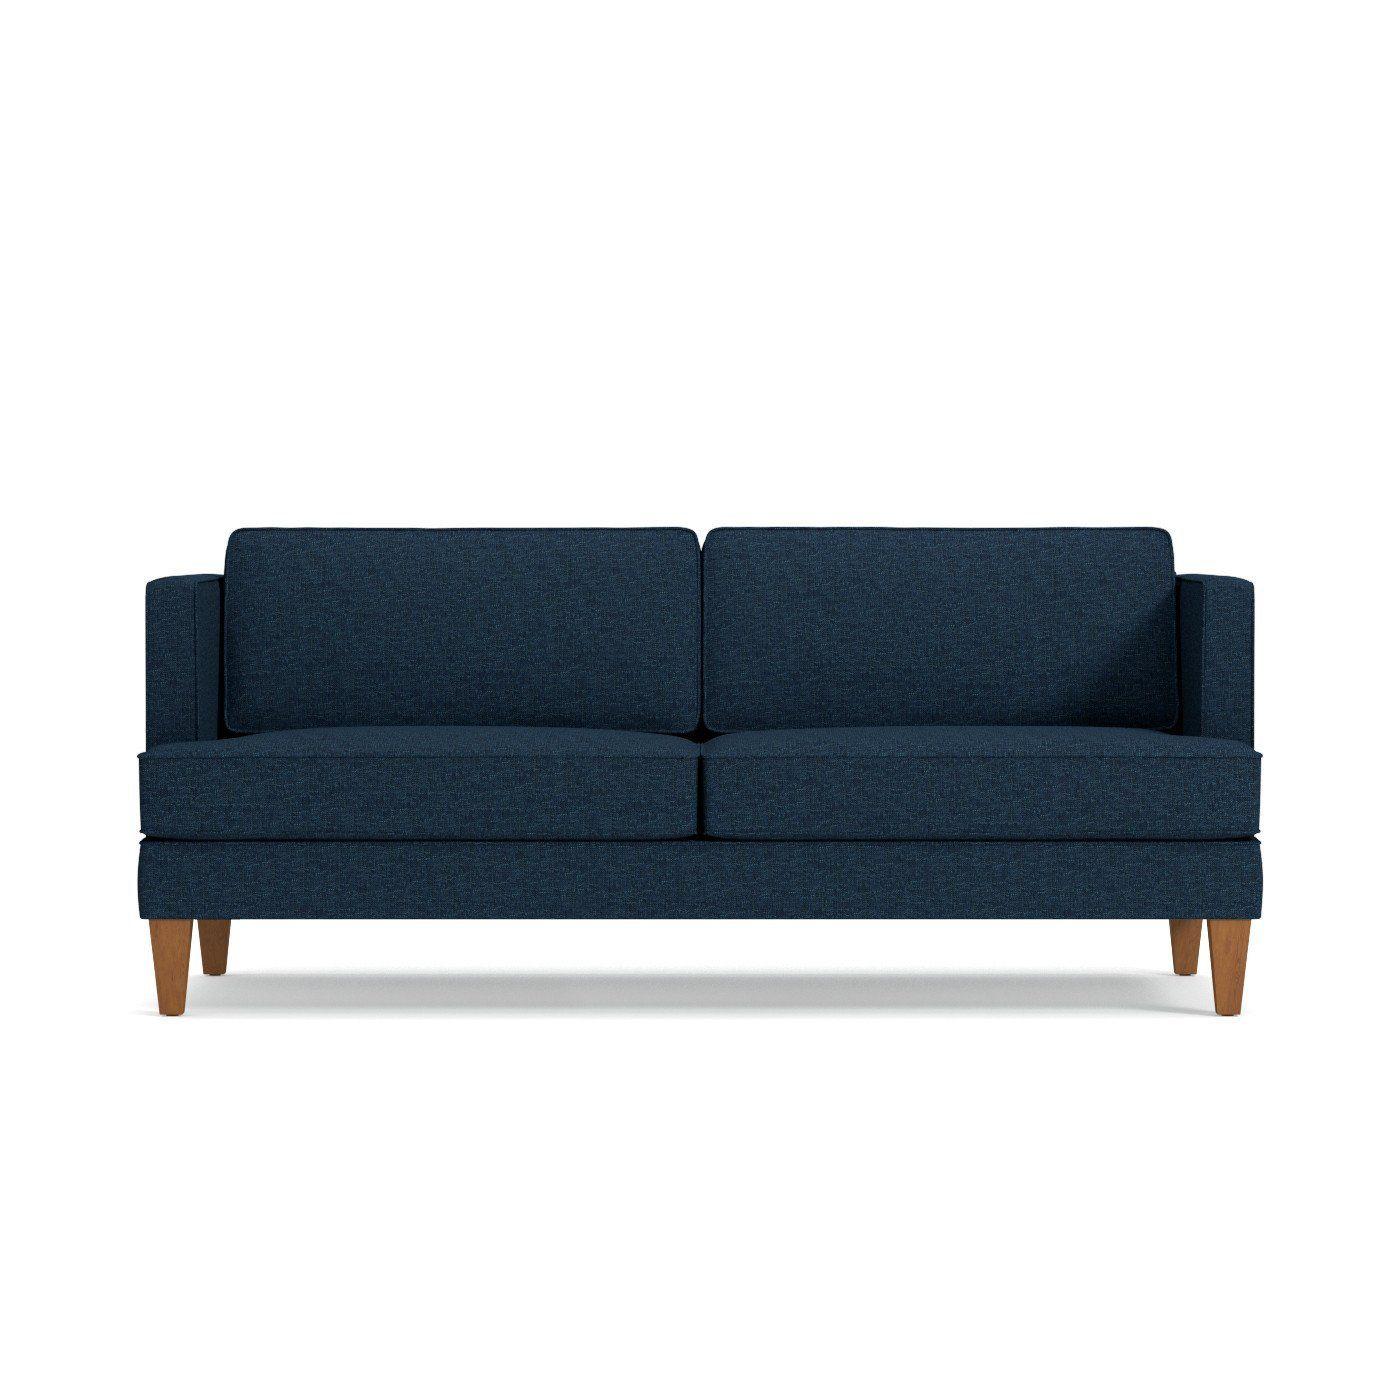 Wood Espresso Upholstery Mahogany Brown Sofa 82″W x 36 5″D x